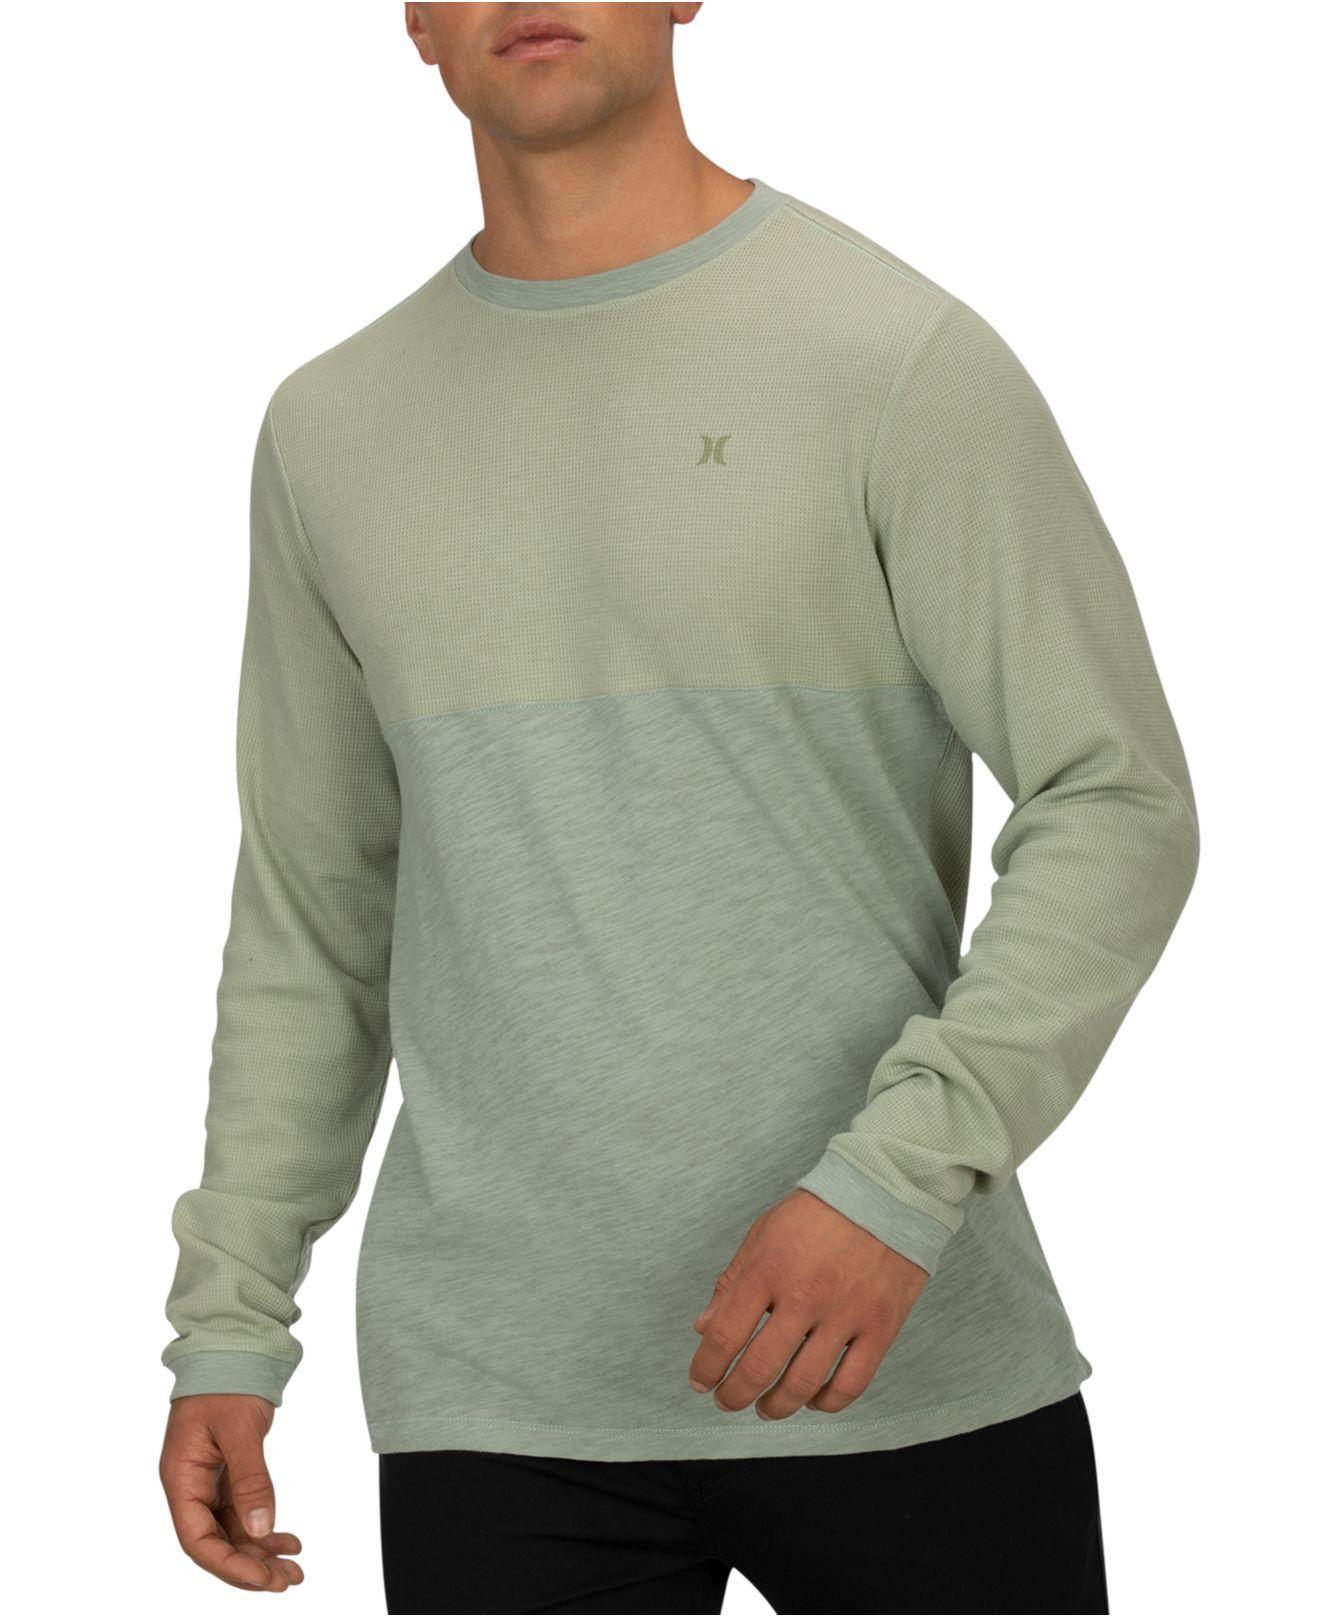 Horizon Thermal Long Sleeved Top Pants Navy L